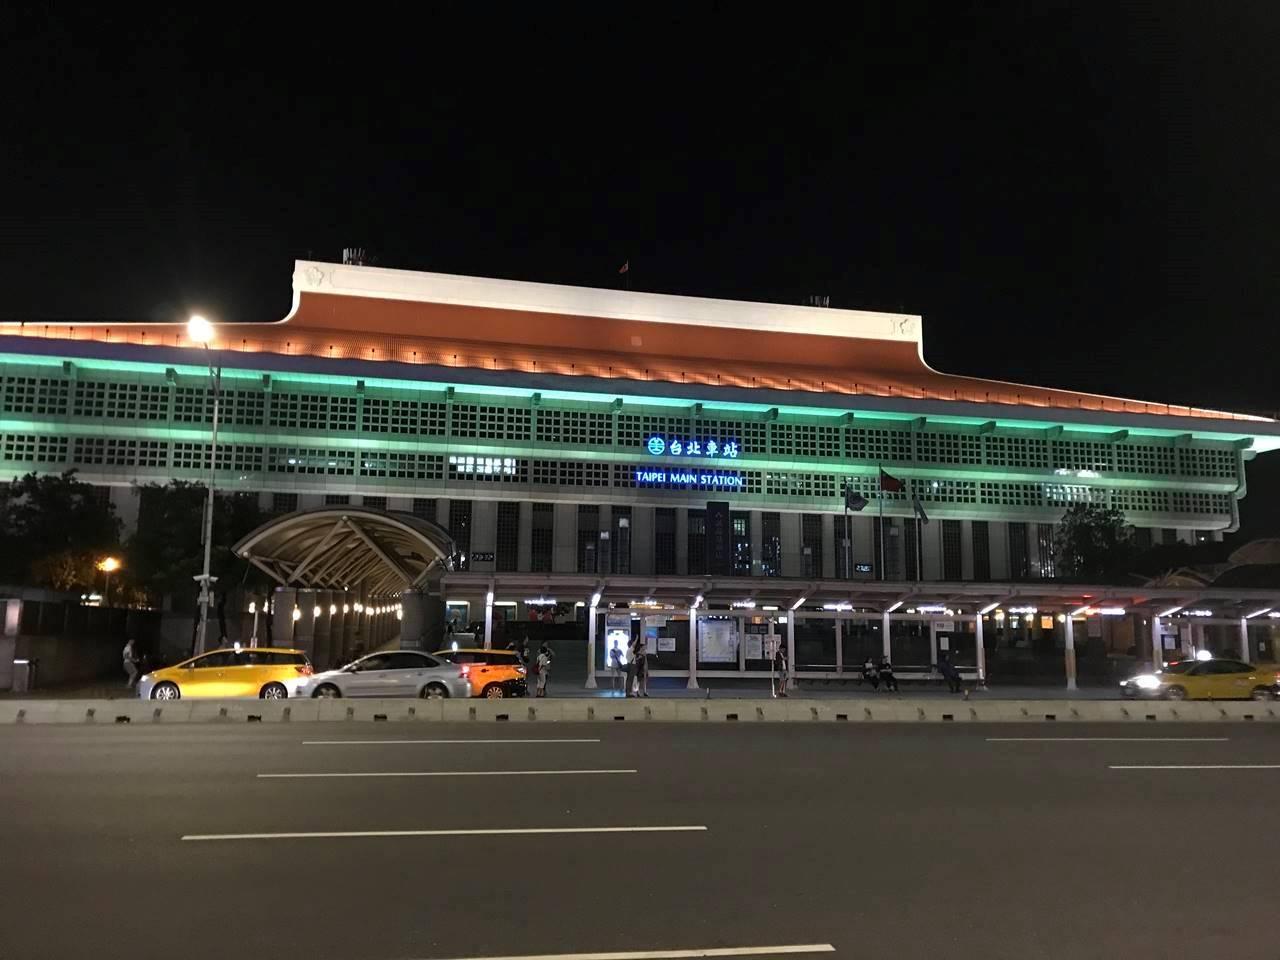 台湾 台北駅の夜景